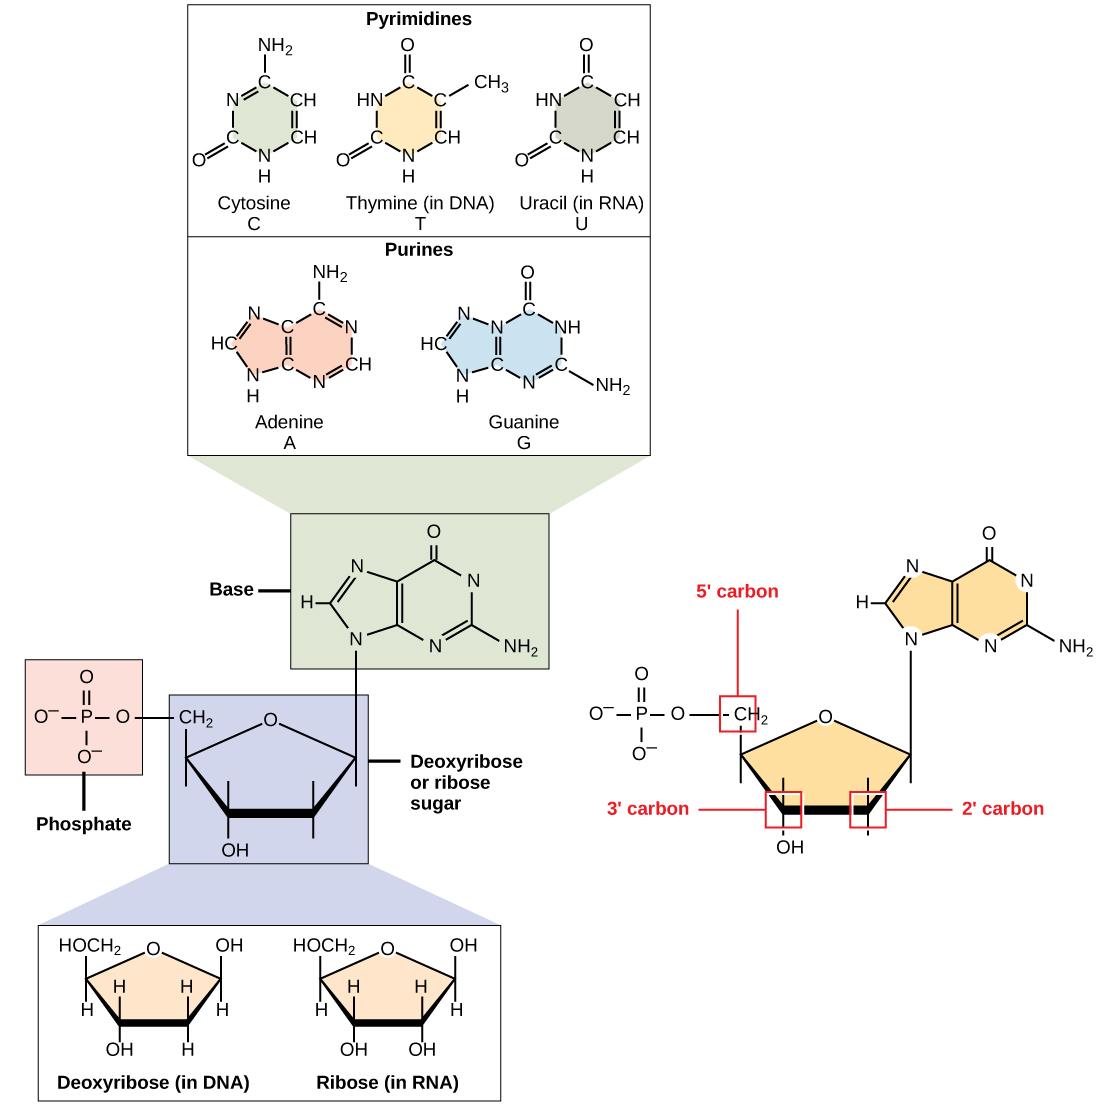 3 5 Nucleic Acids Biology 110 Psu Dubois